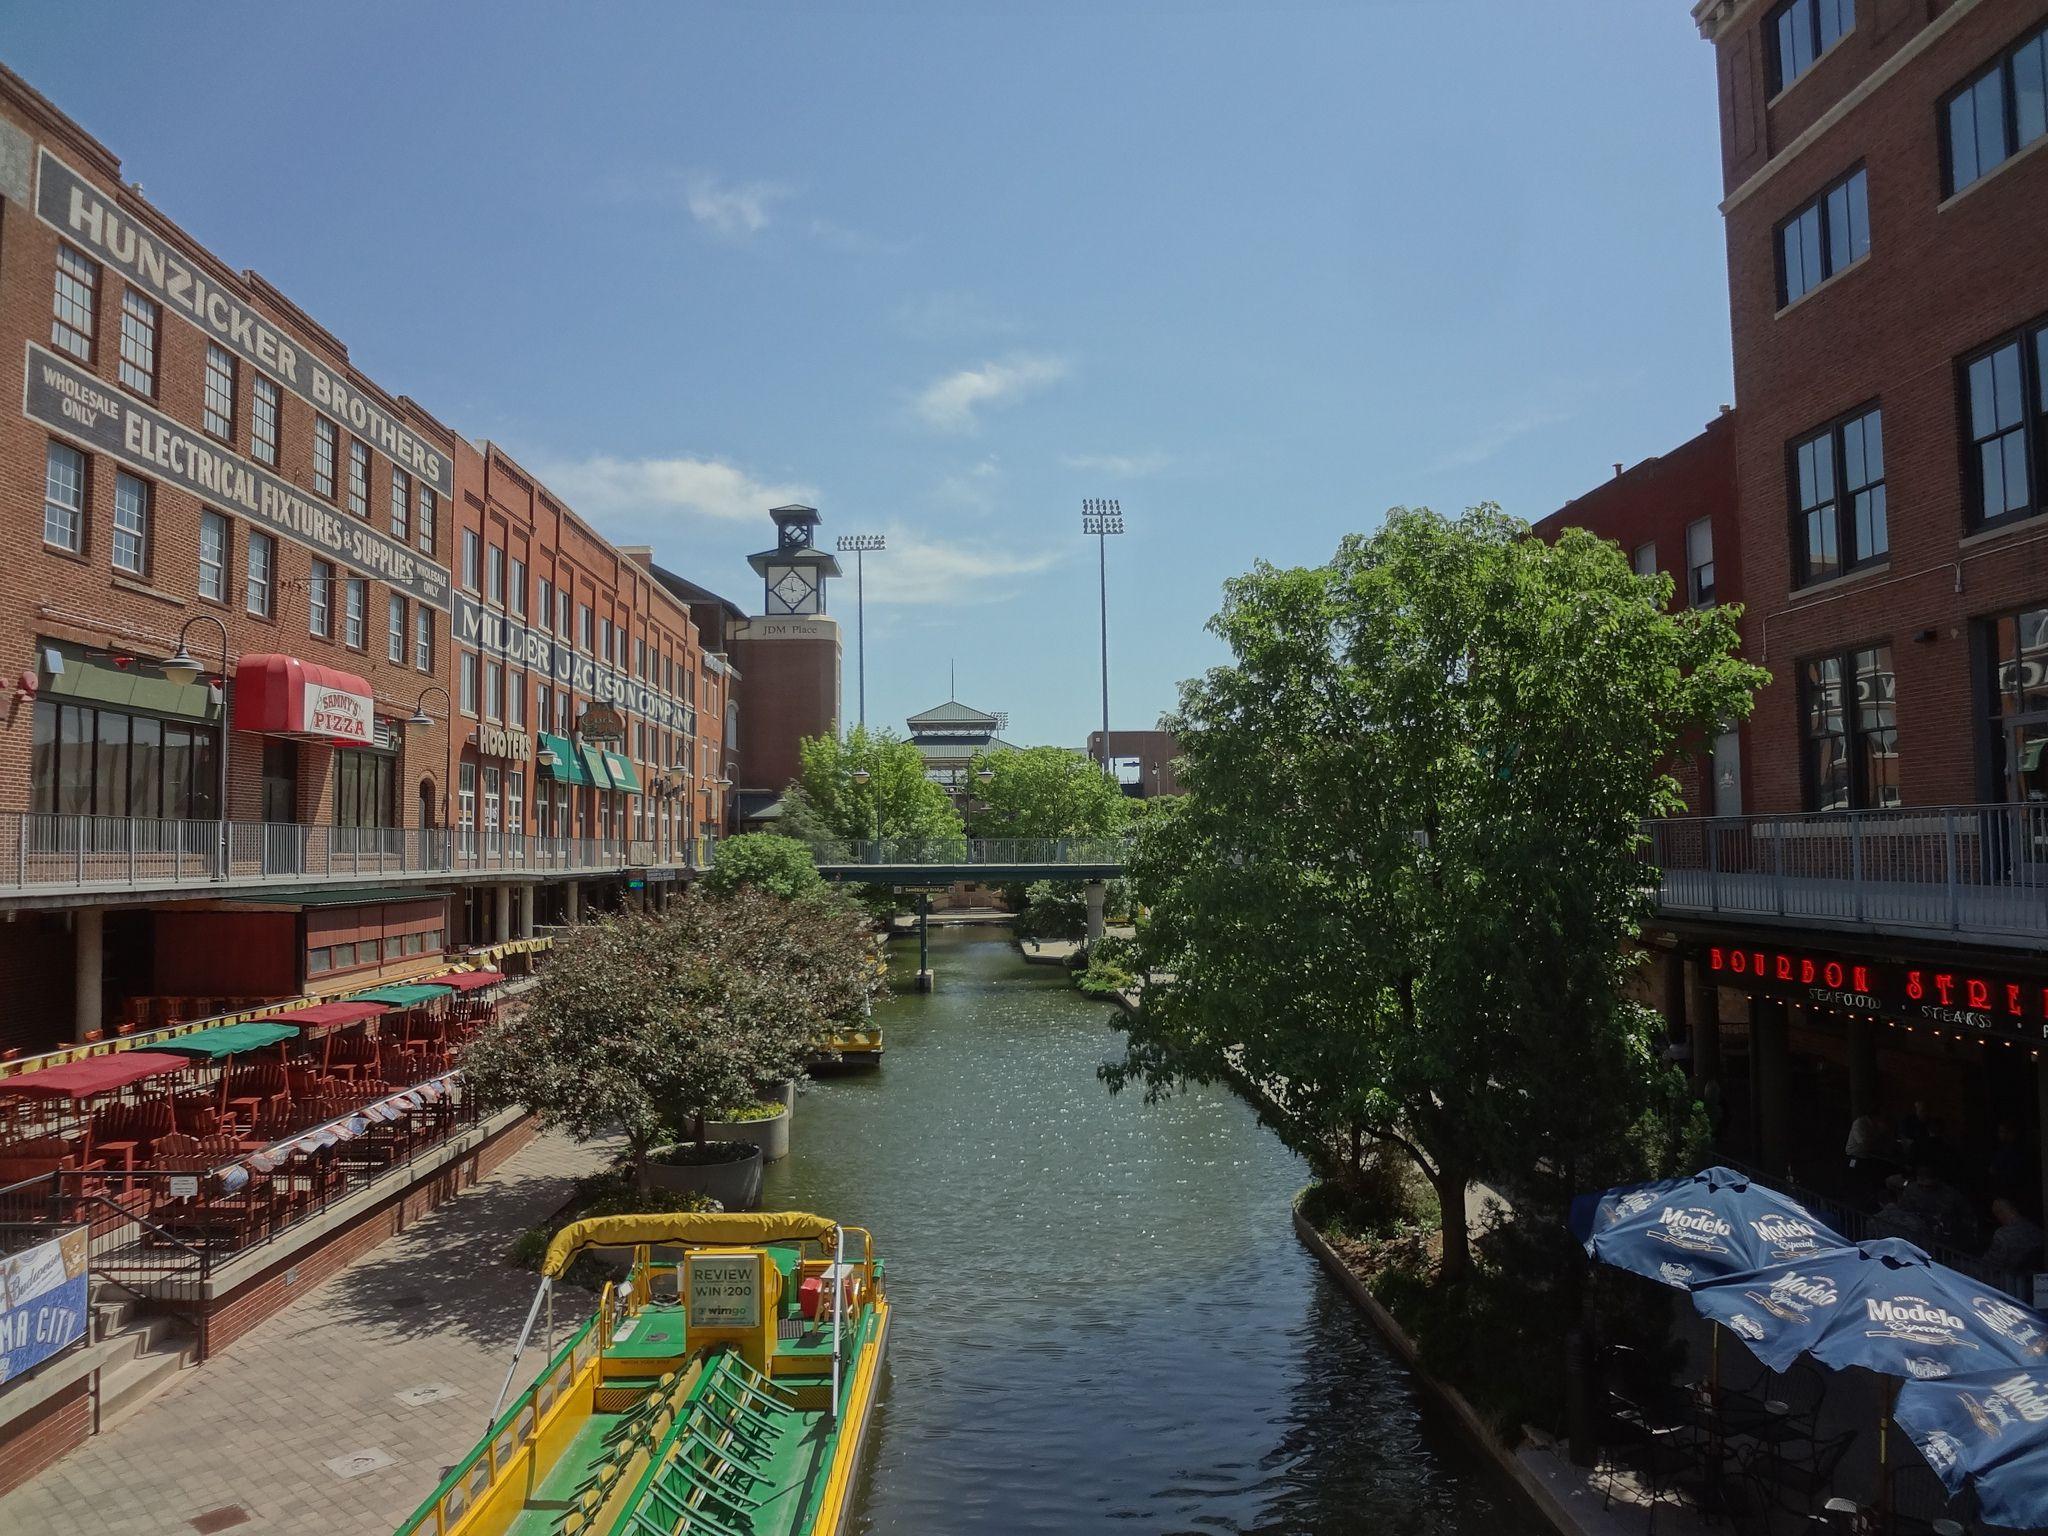 Dapatkan Di Luar Dan Nikmati Oklahoma City Dengan Ini Top 10 Aktiviti